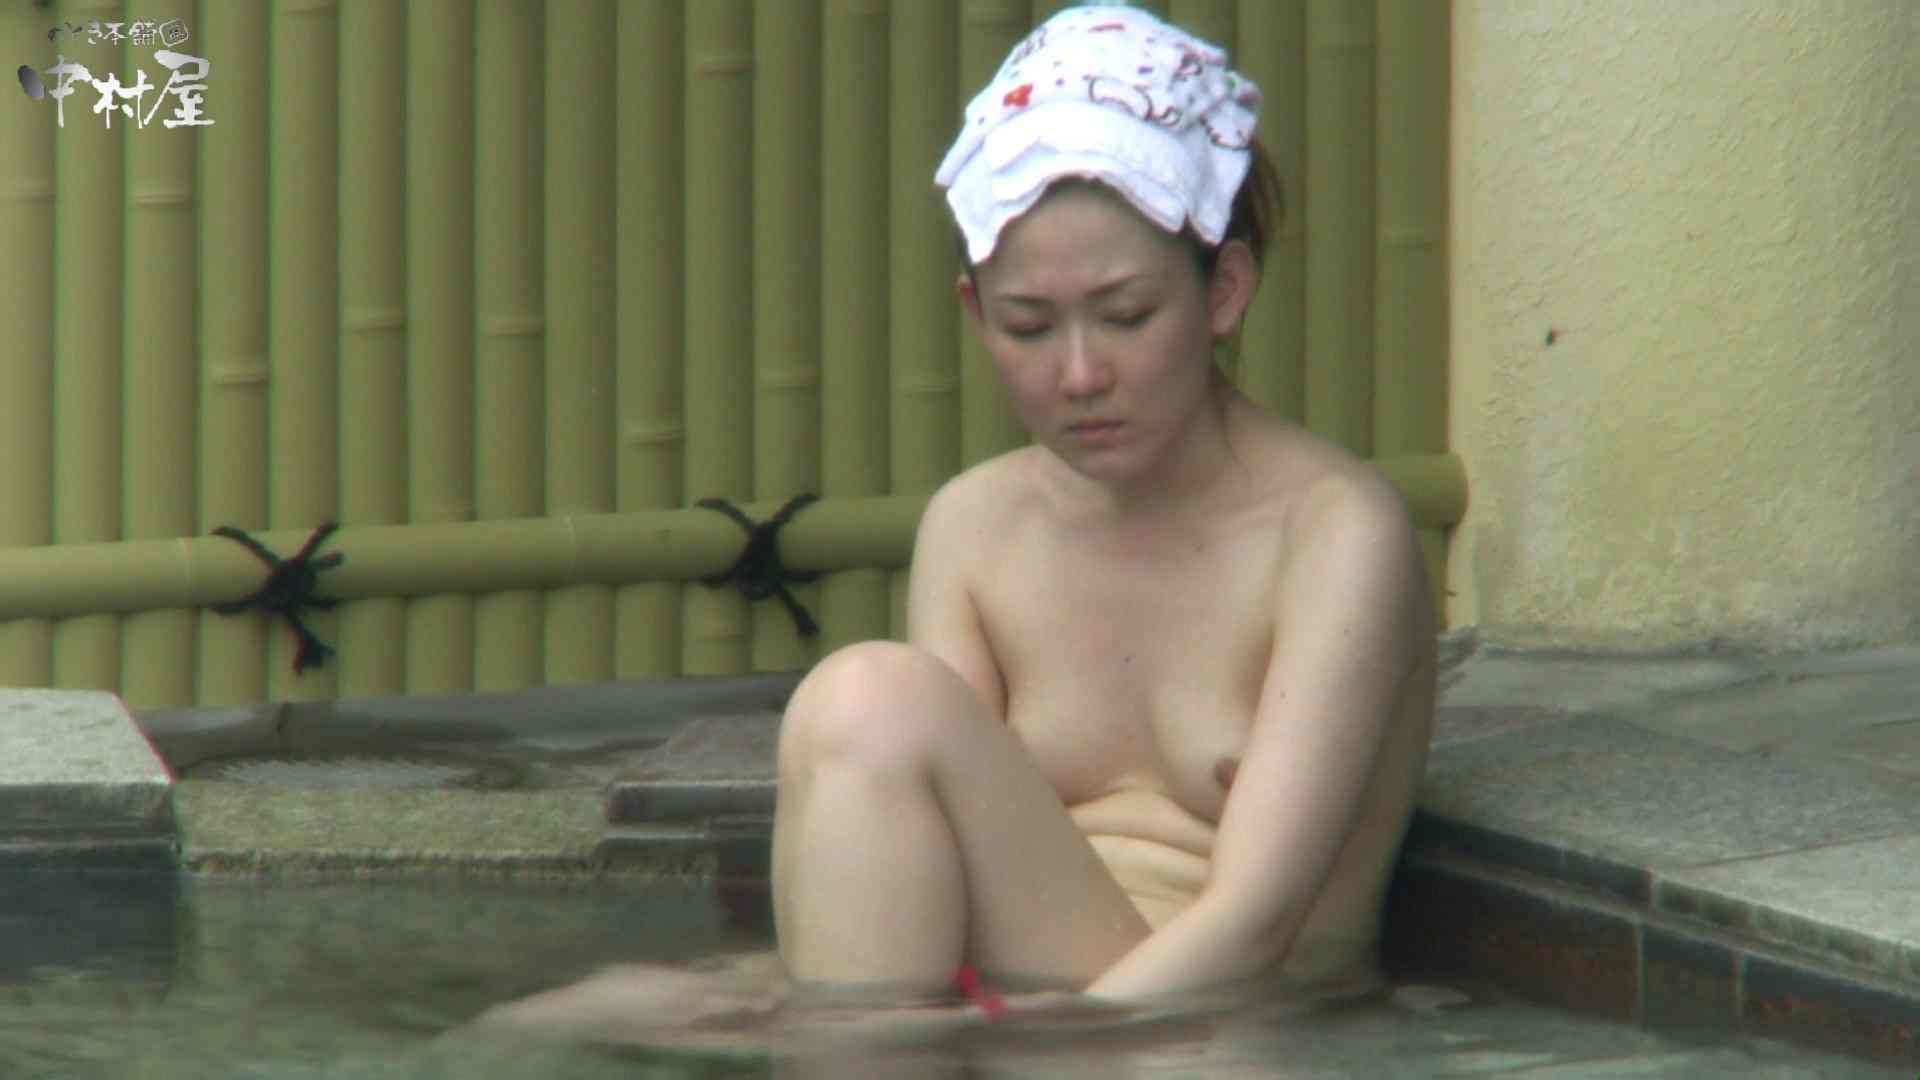 Aquaな露天風呂Vol.943 盗撮 セックス無修正動画無料 108画像 104